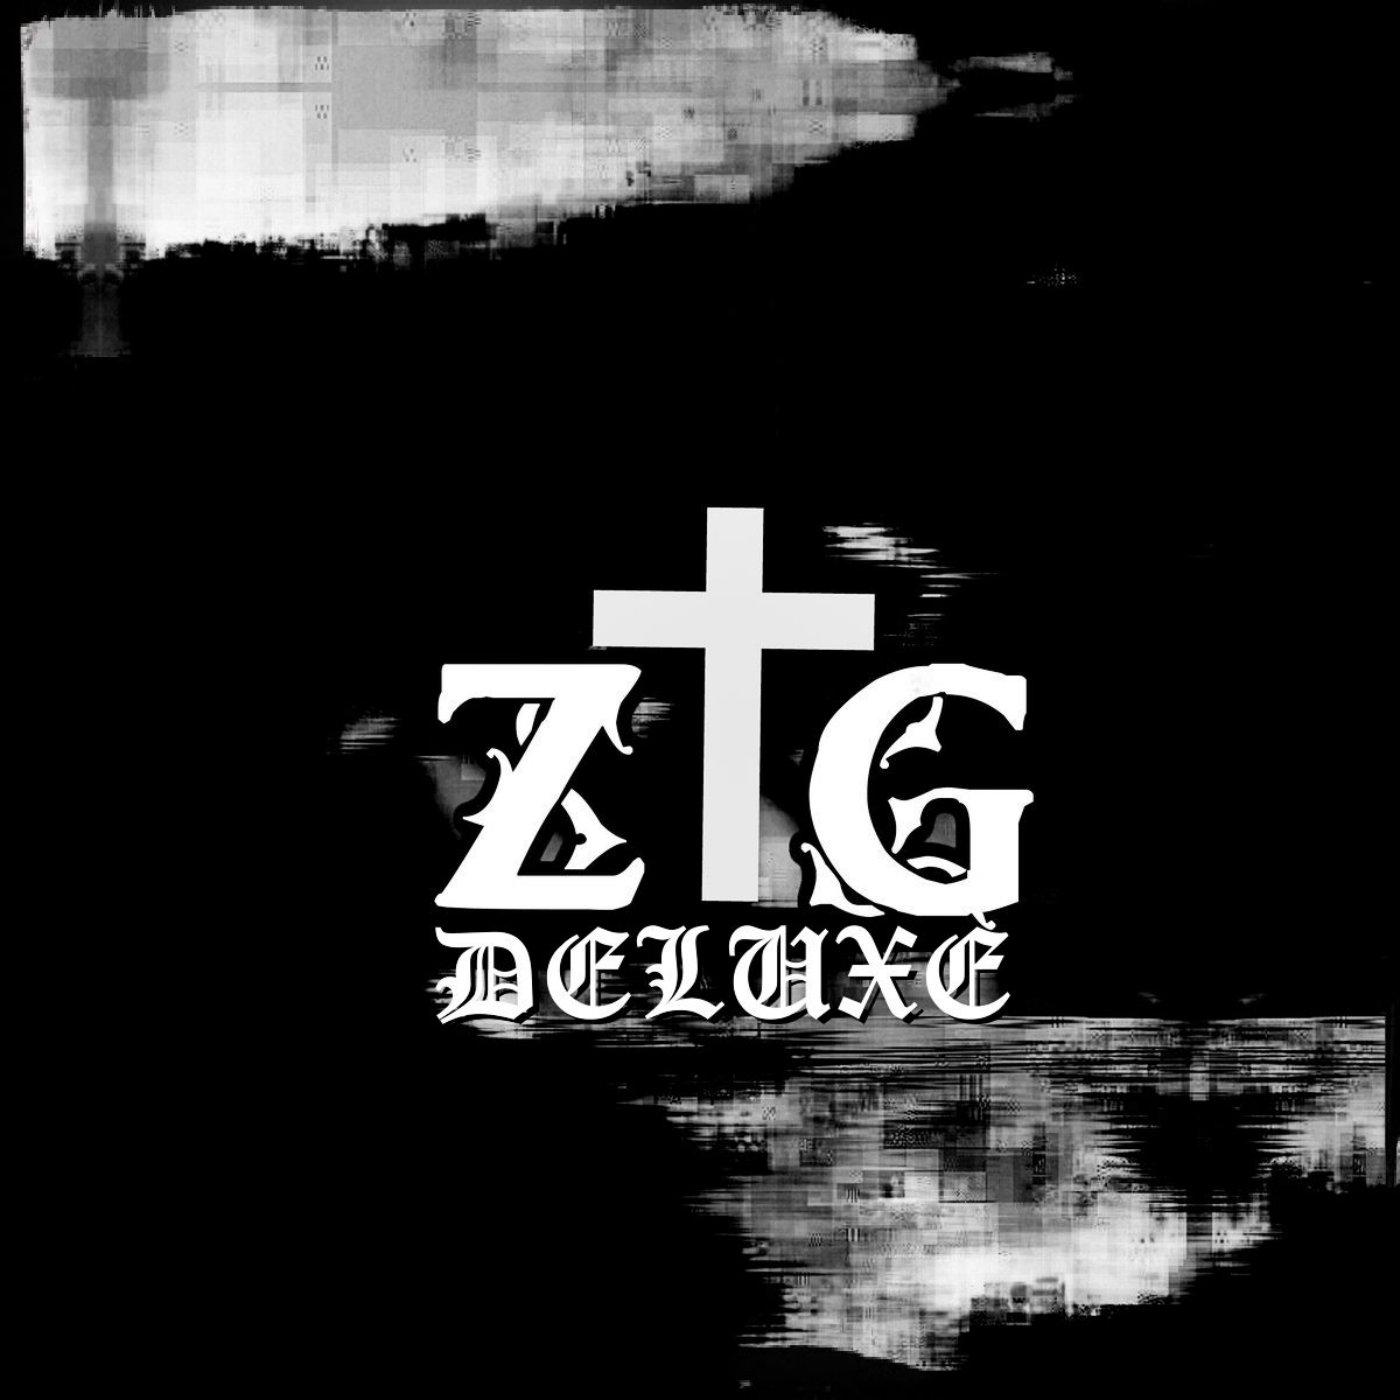 ZeitGod Album Cover